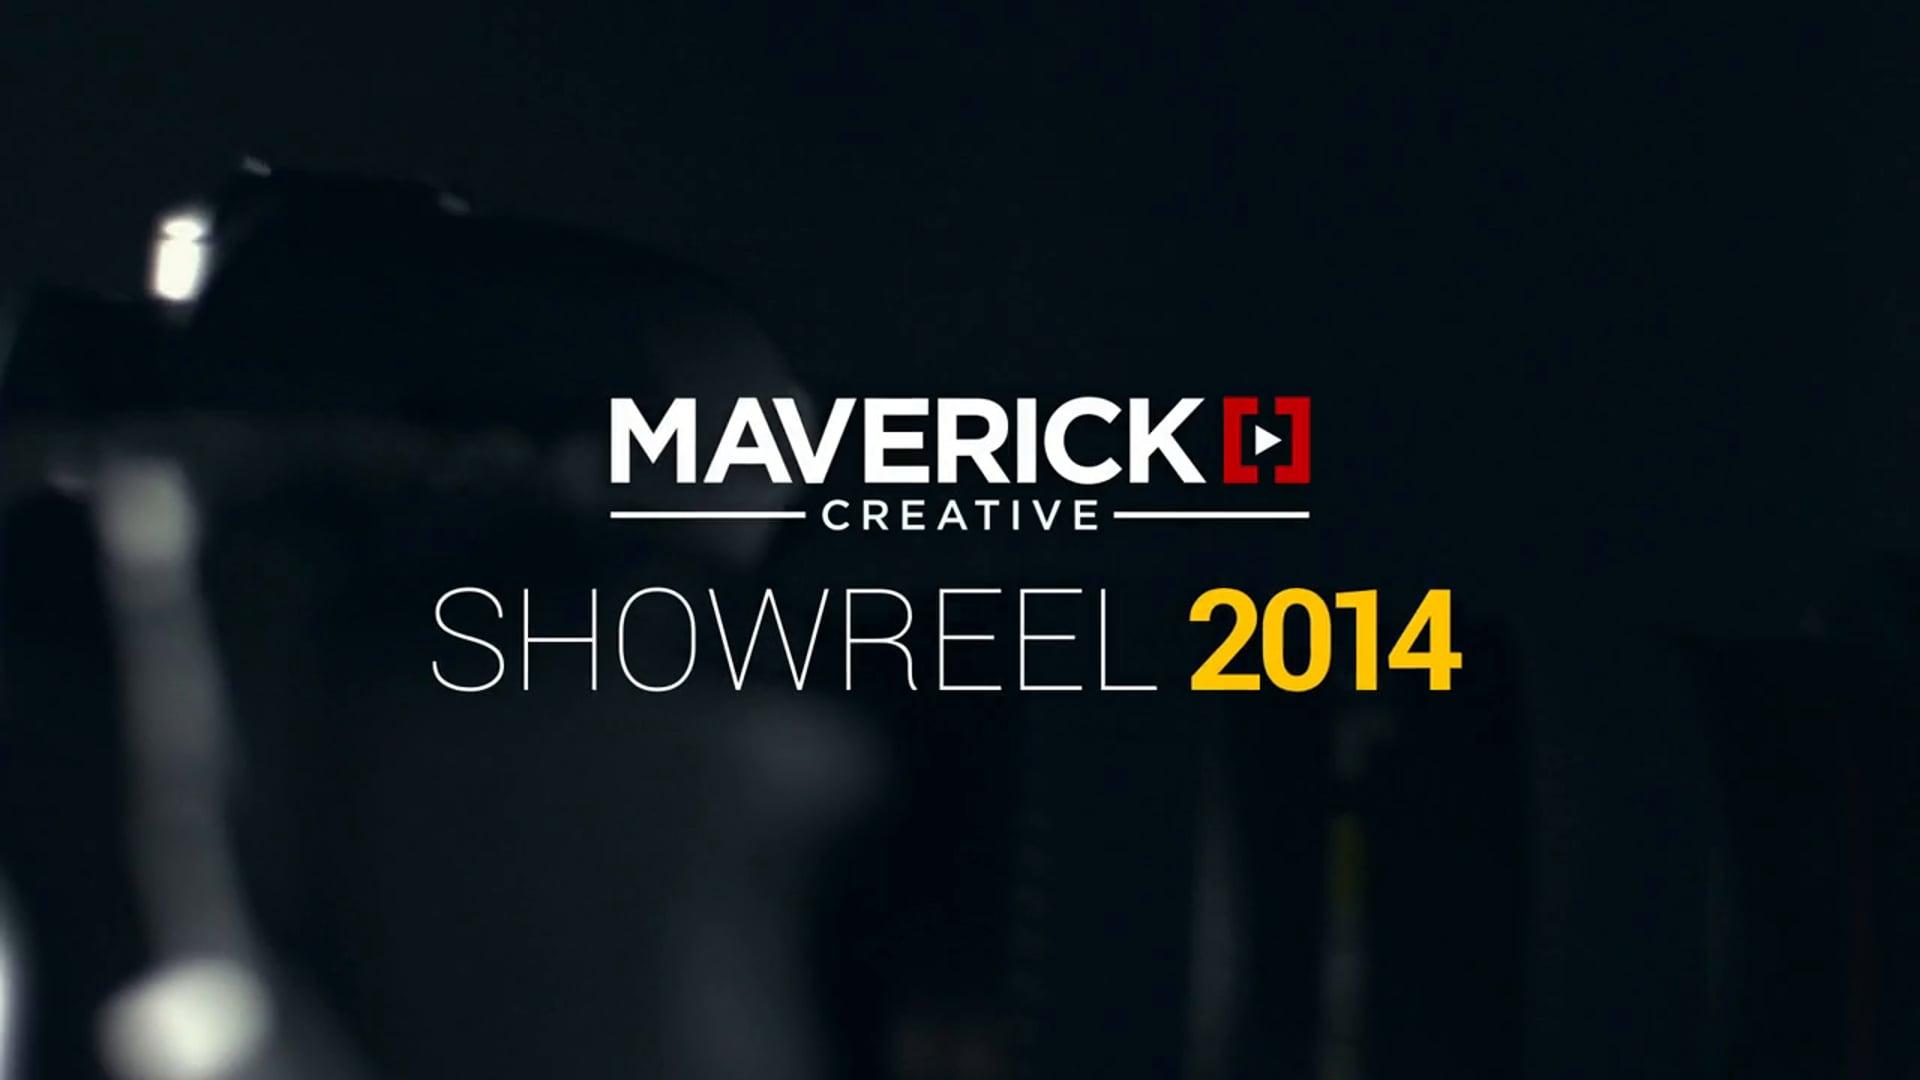 Maverick Creative - Showreel 2014